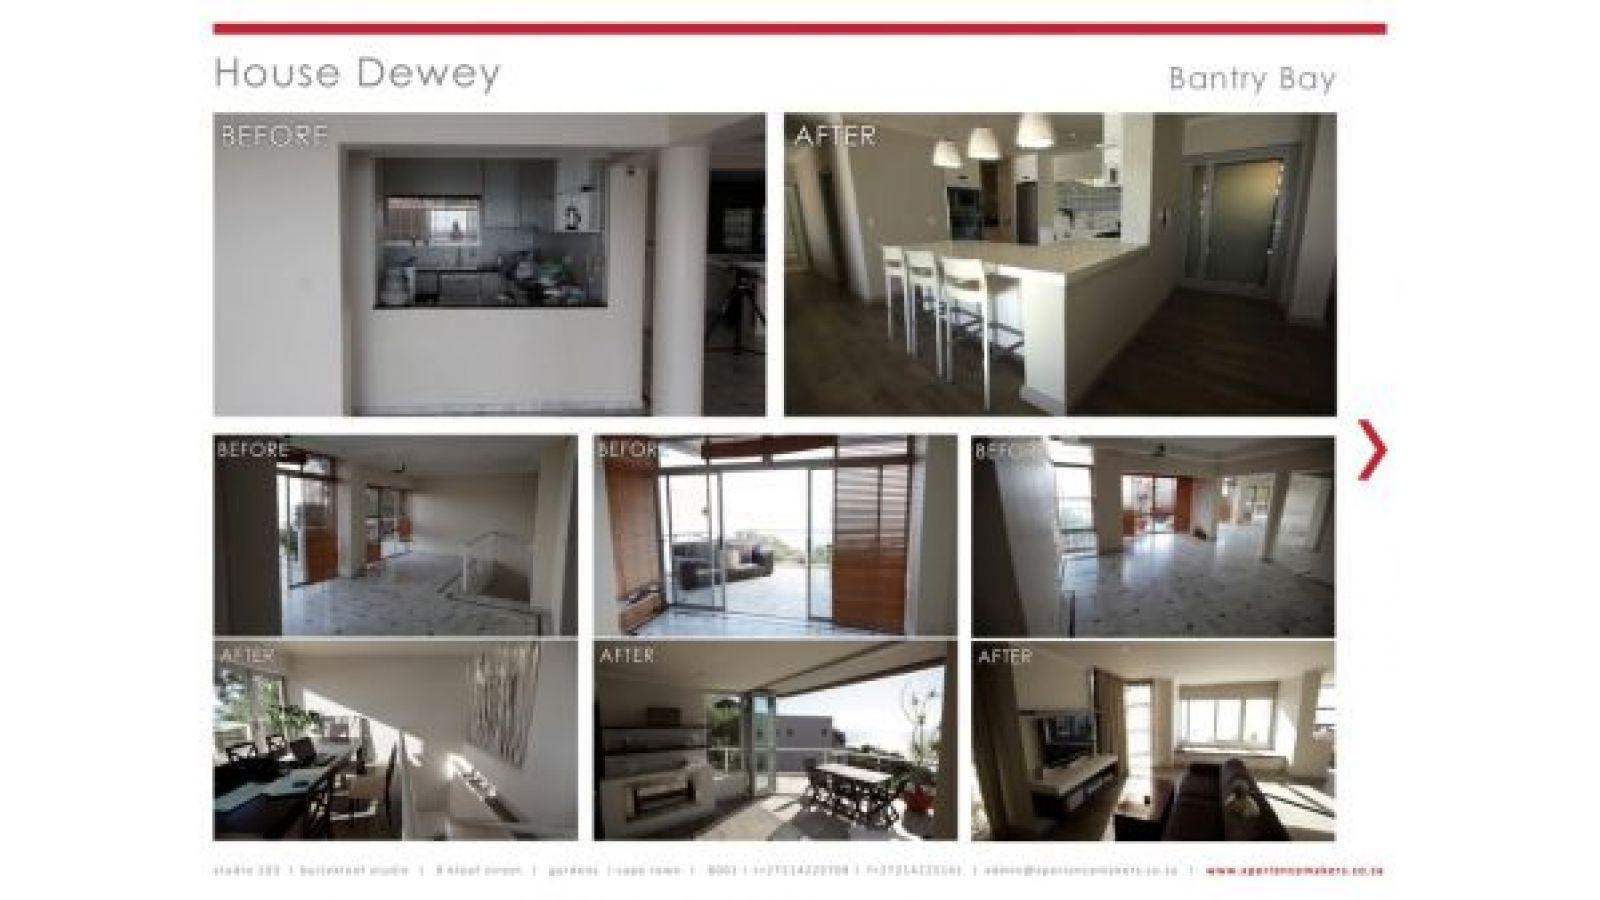 House Dewey